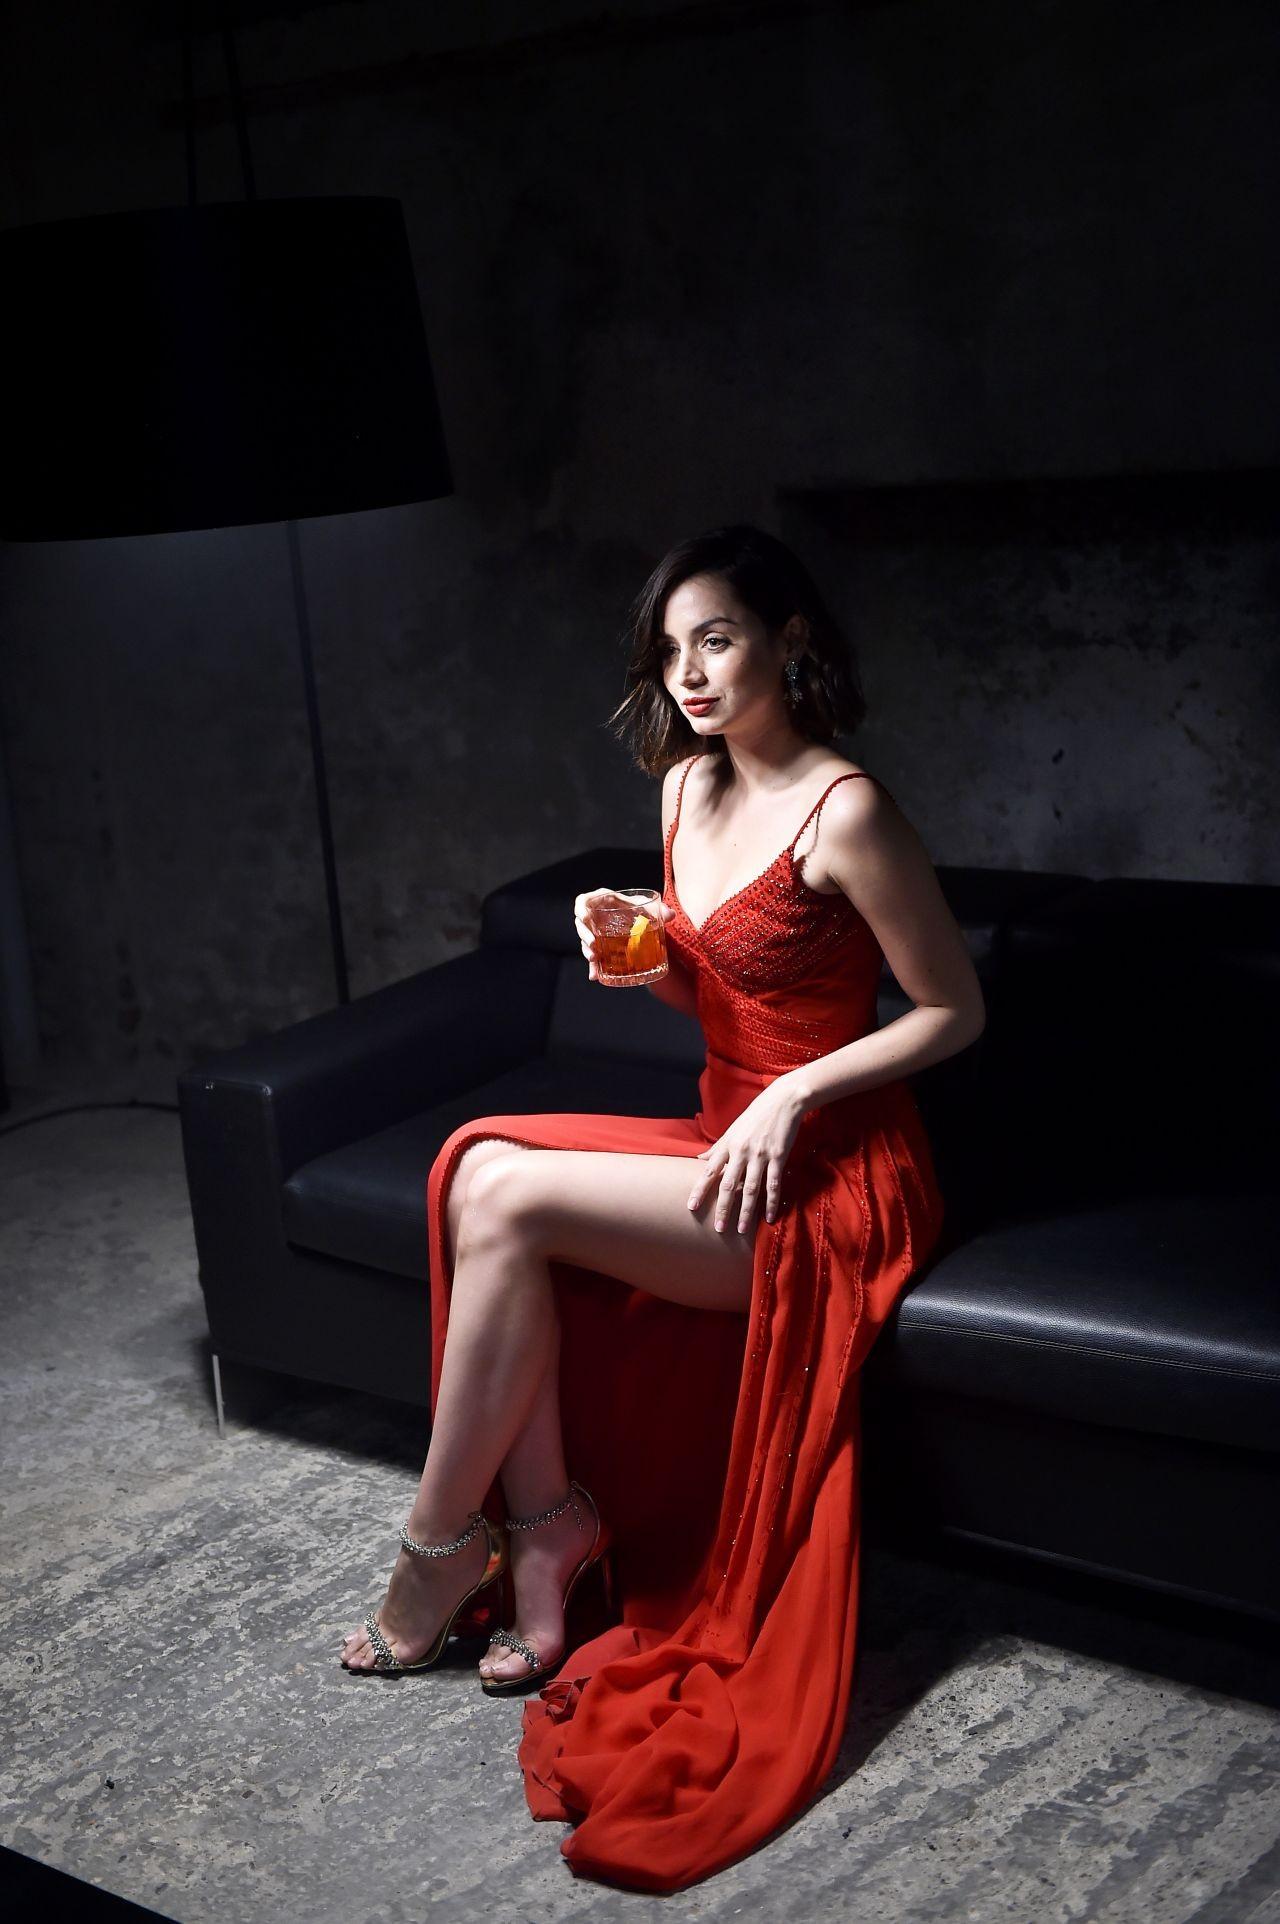 Ana Celia De Armas Sex ana de armas nude, naked - pics and videos - imperiodefamosas